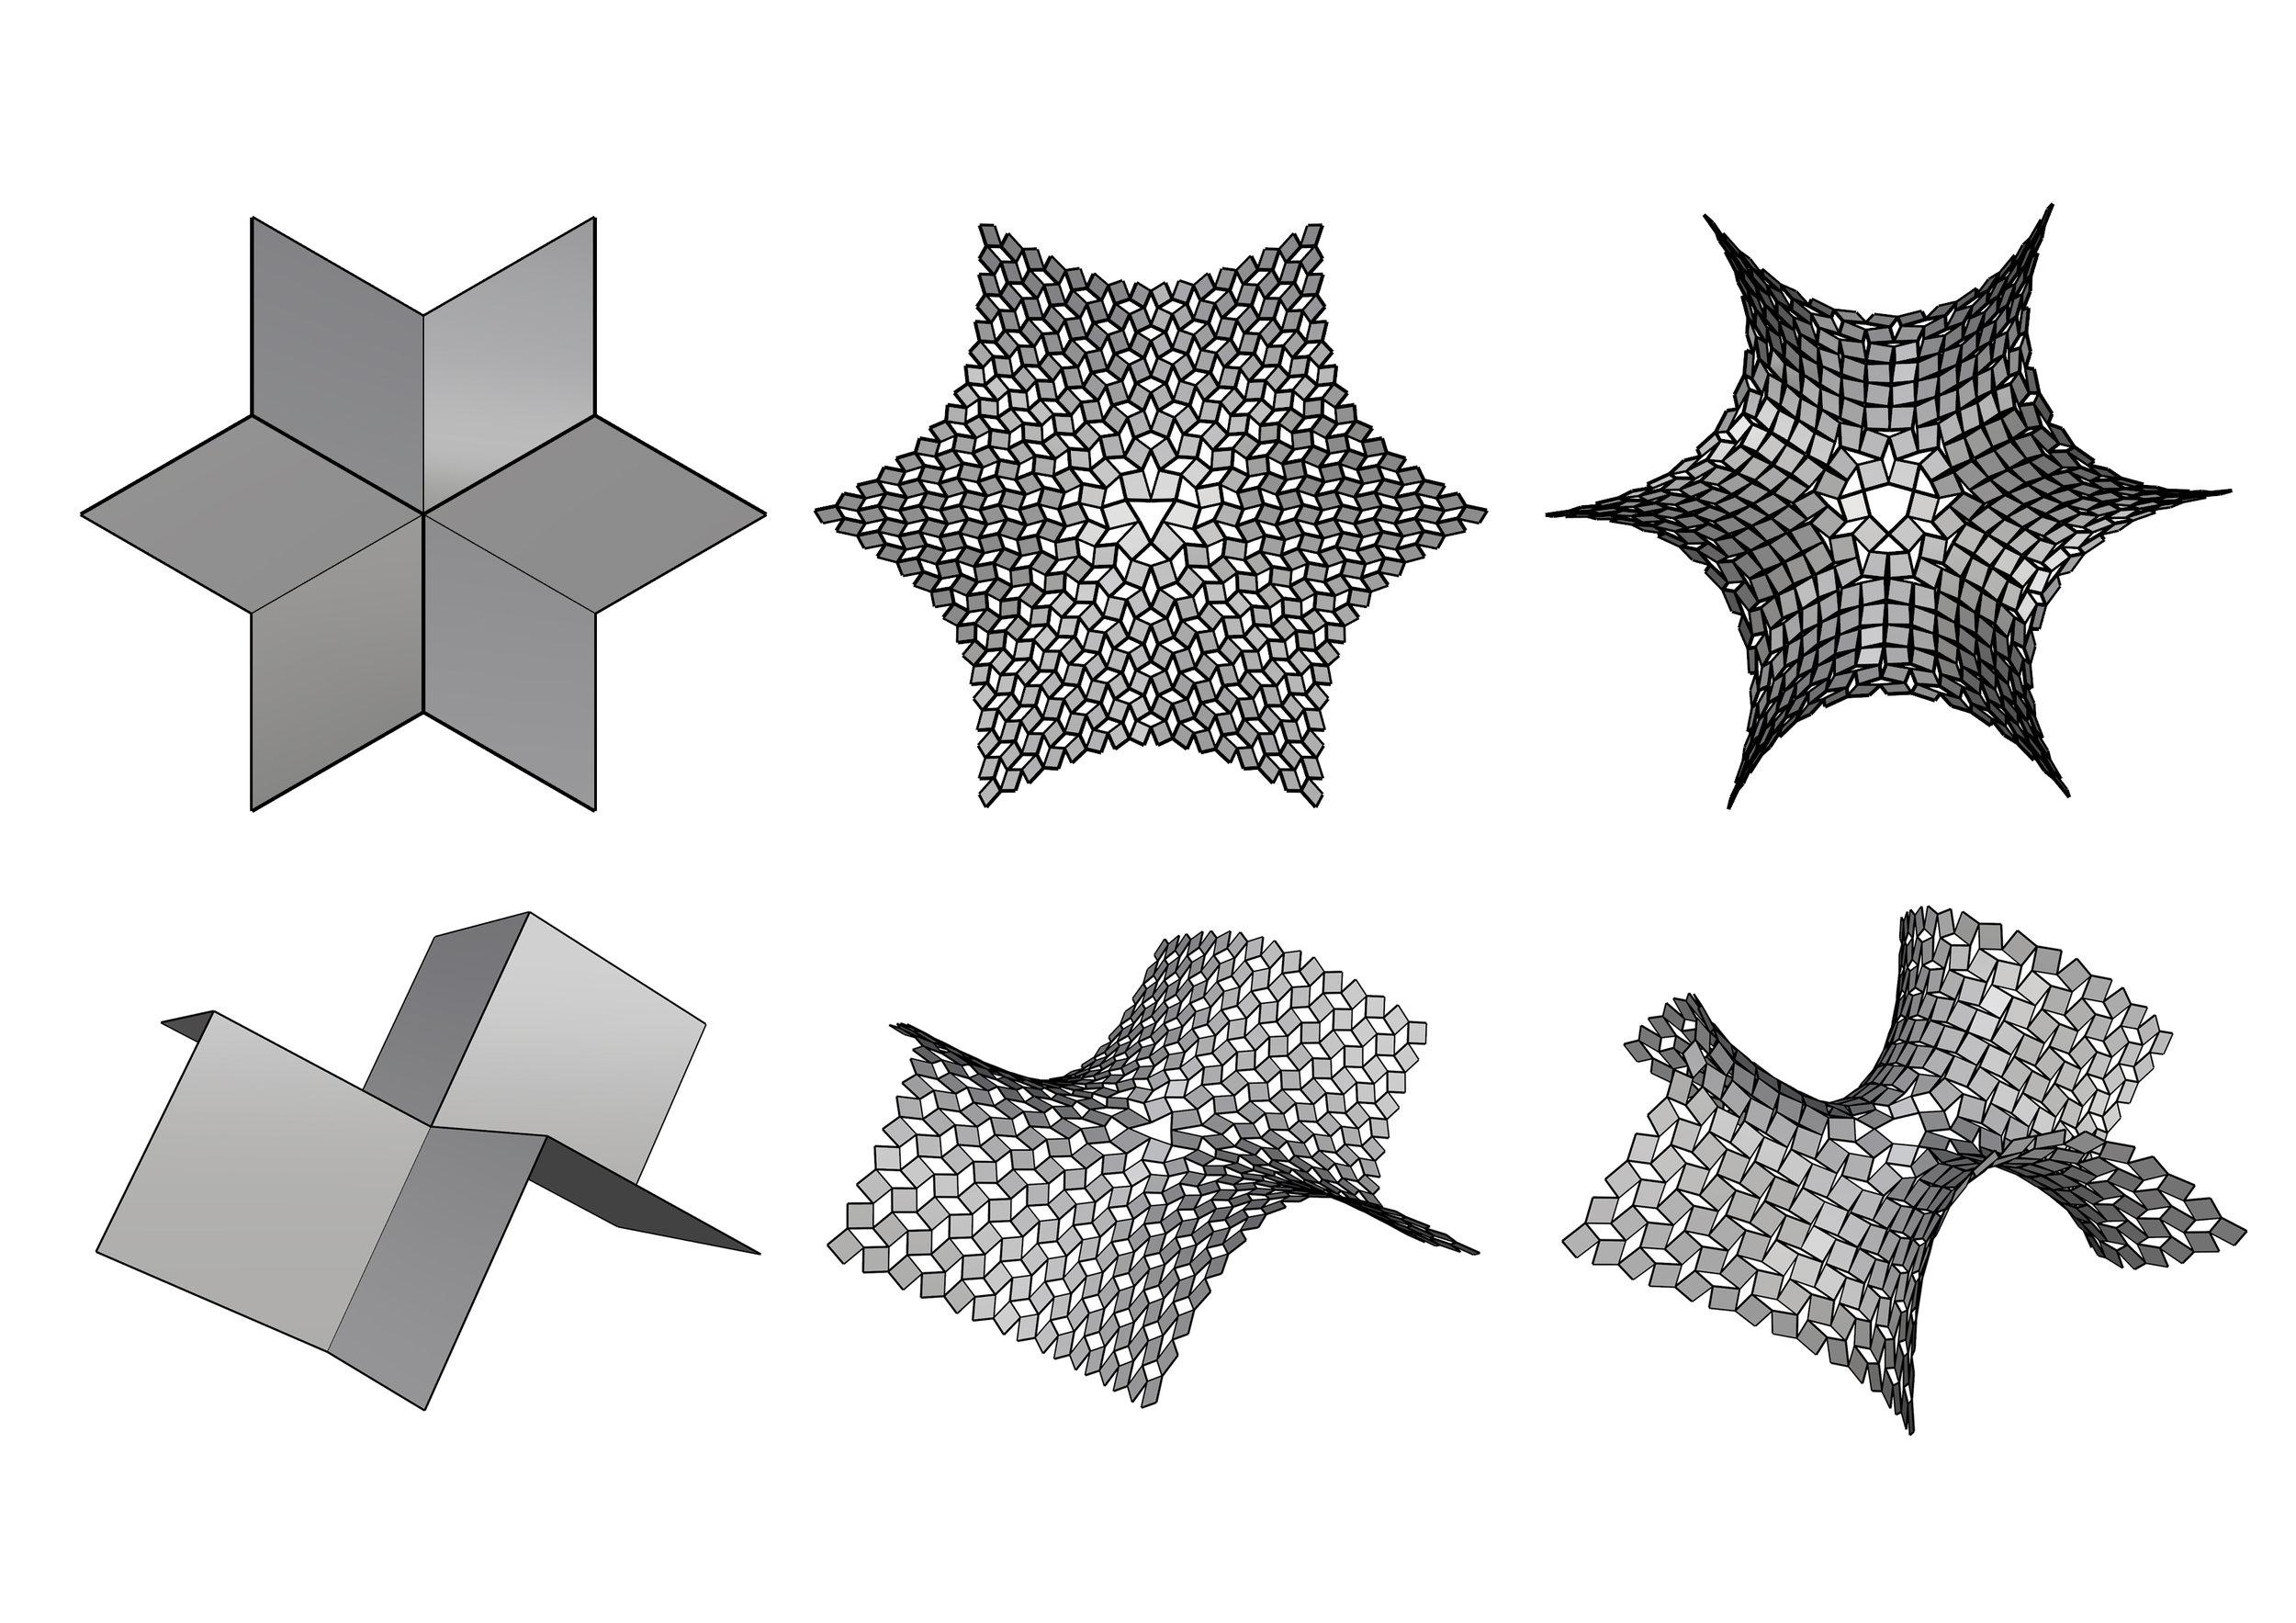 Kintetic Tiling 002.jpg